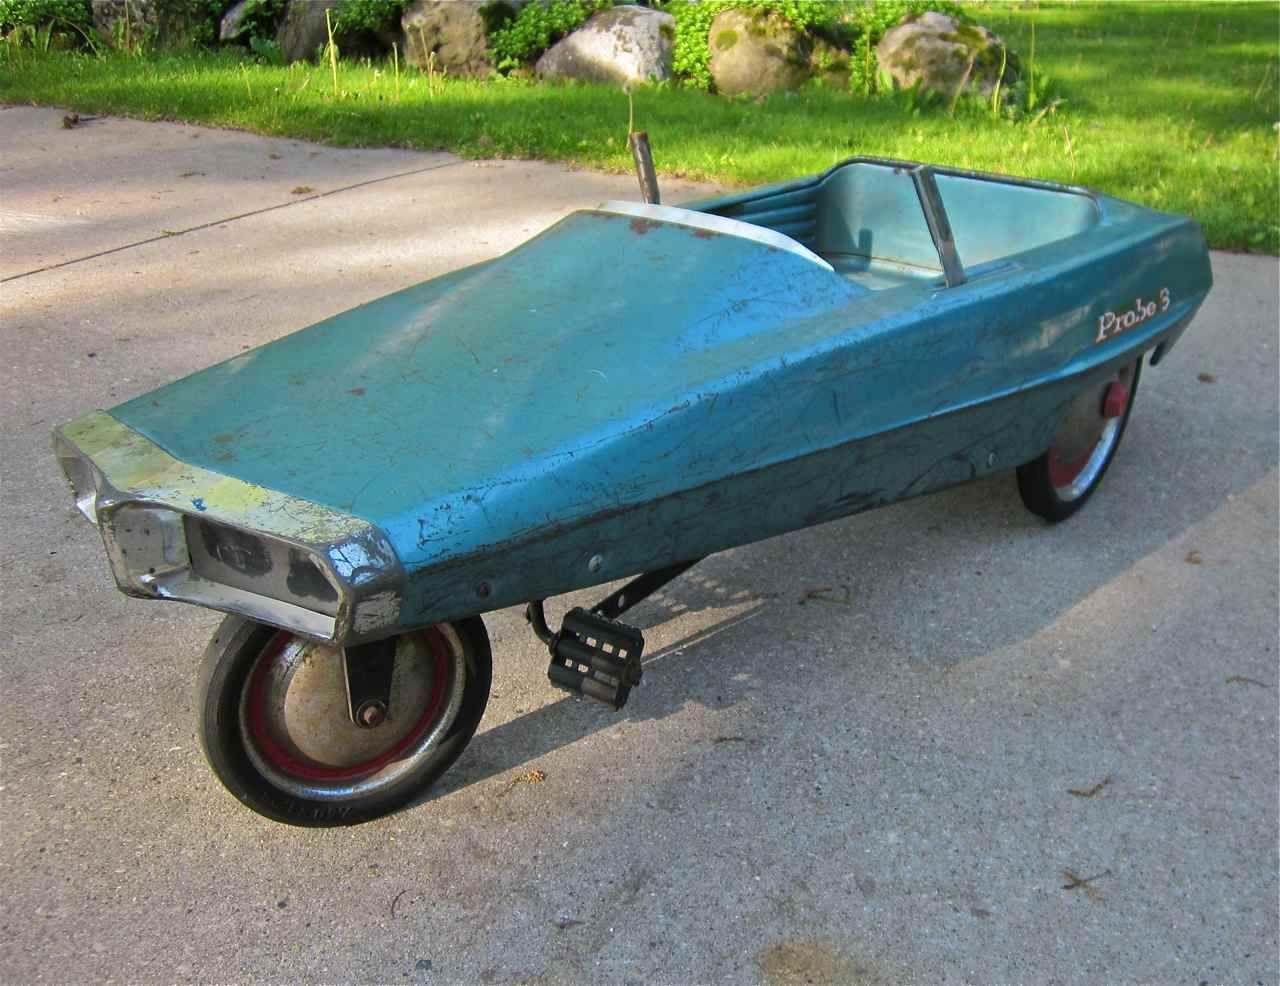 Pedal Car Pedal Cars Toy Pedal Cars Vintage Pedal Cars